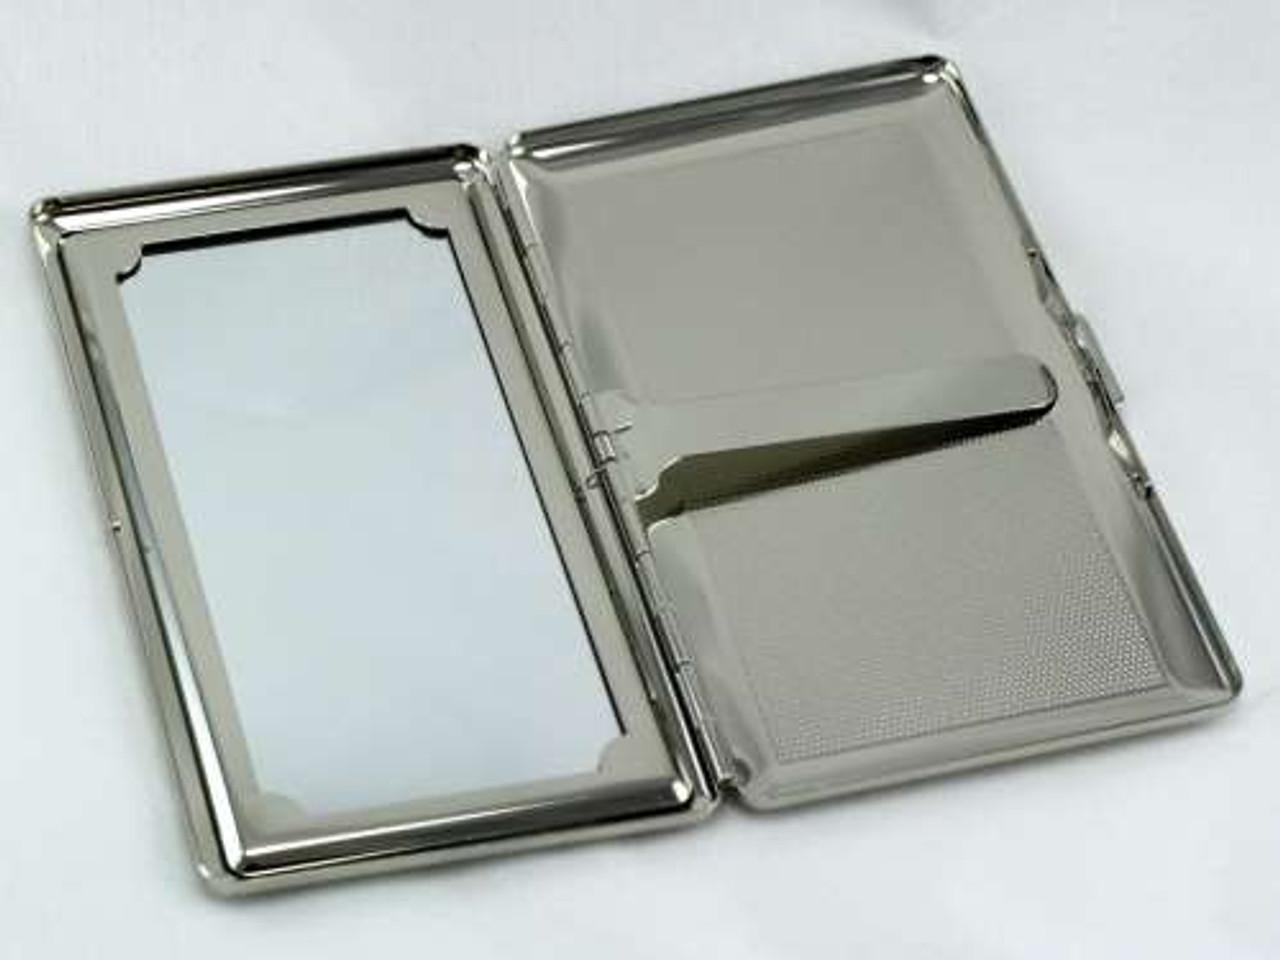 Polka Dot Mirror Cigarette Case